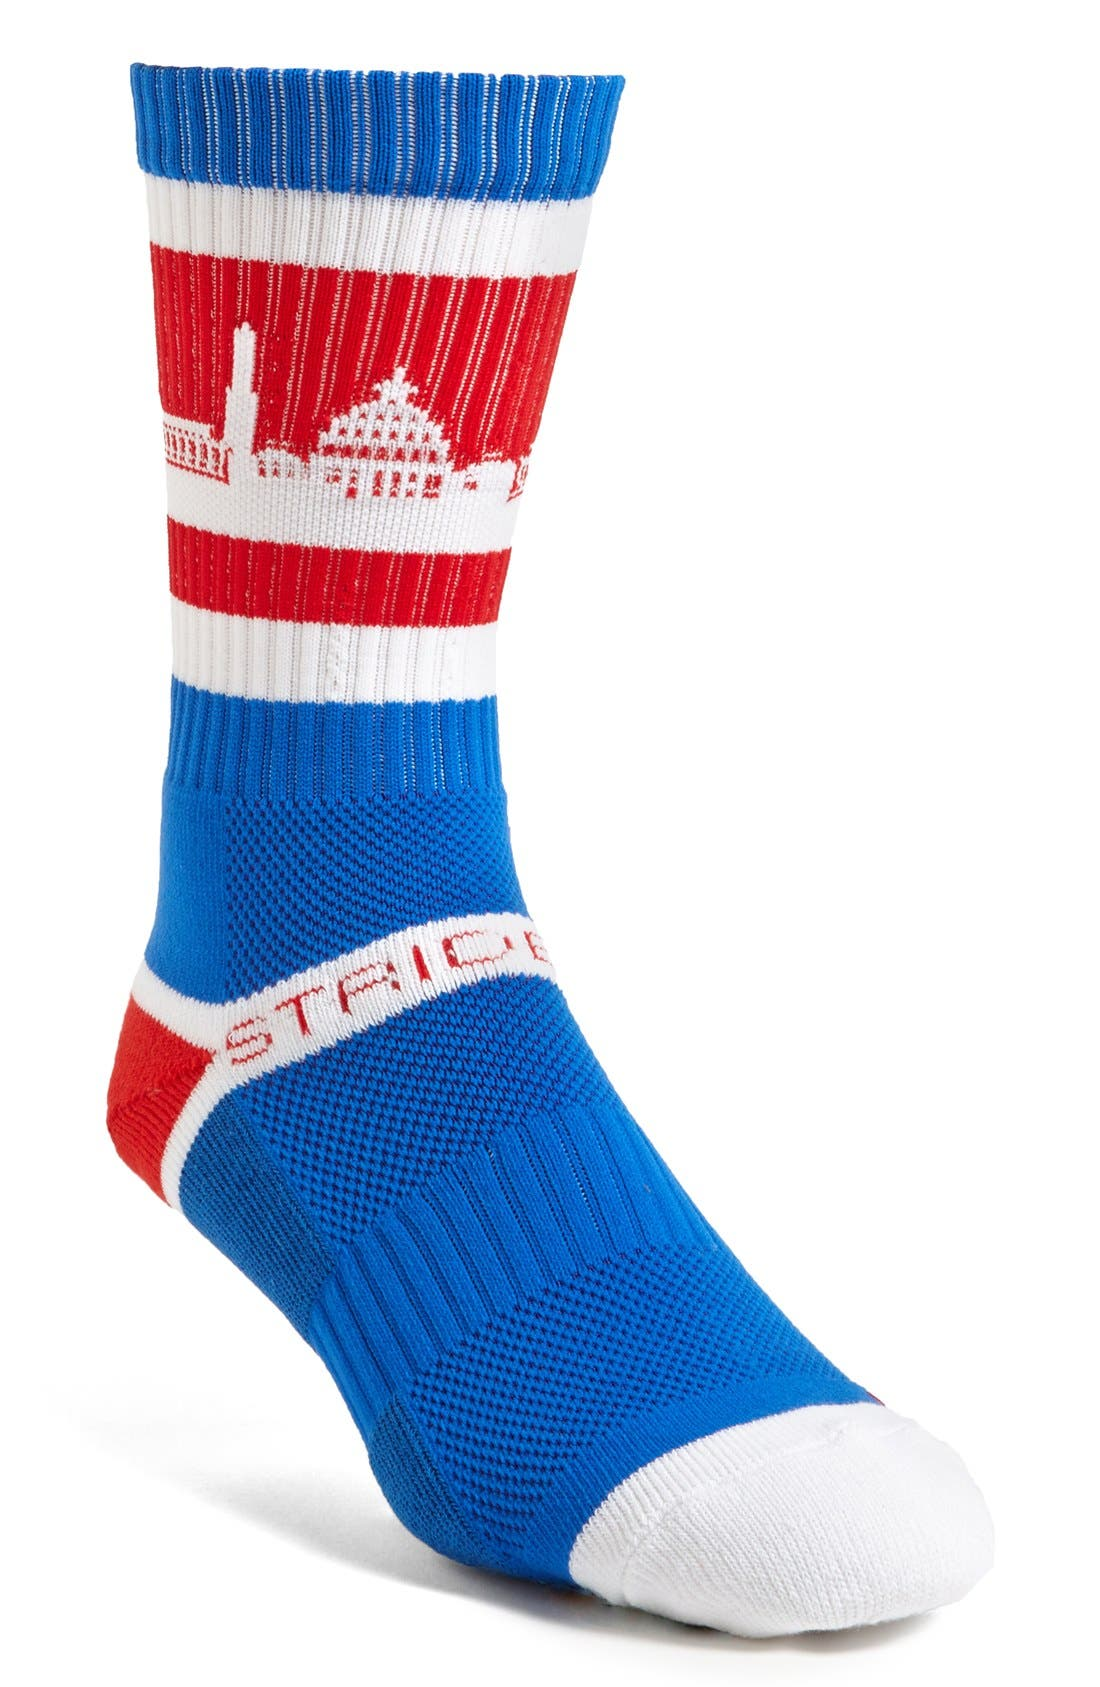 Main Image - STRIDELINE 'Washington D.C.' Socks